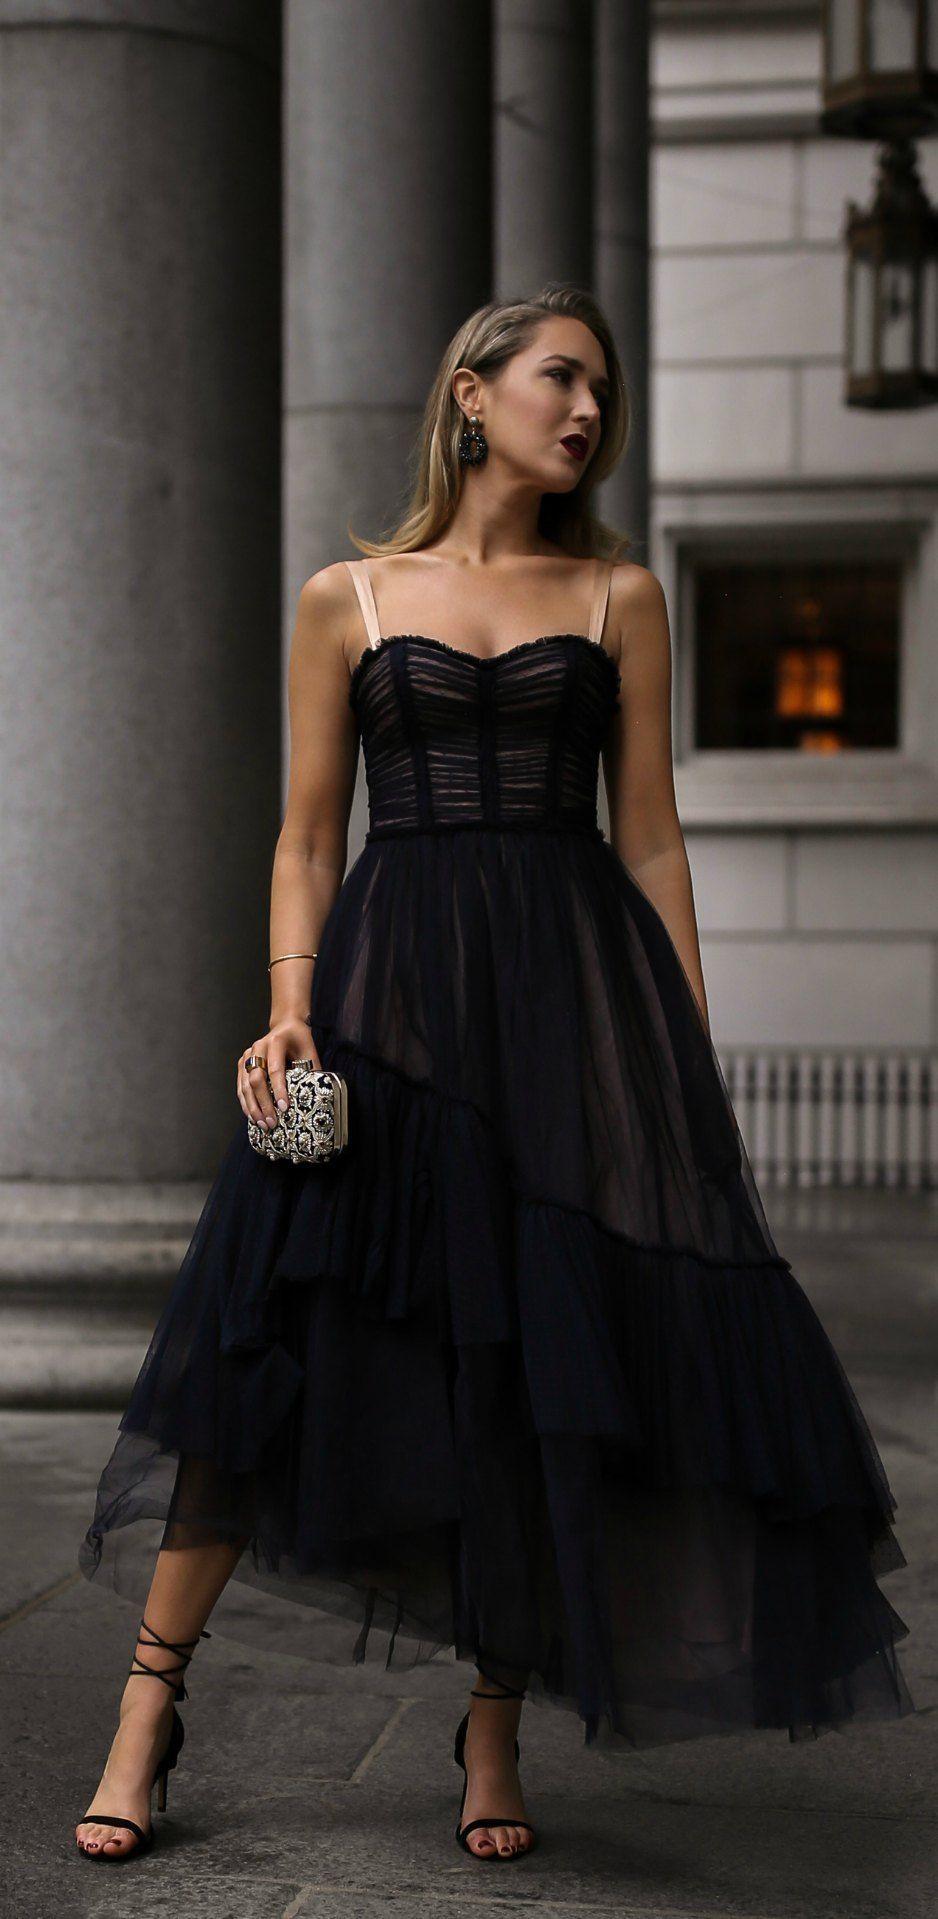 30 Dresses In 30 Days Day 19 Charity Gala Black Lace Tulle Bodice Style Flowy Midi Dress Black Strappy Ankle W Fashion Dress Accessories Black Tie Dress [ 1919 x 938 Pixel ]